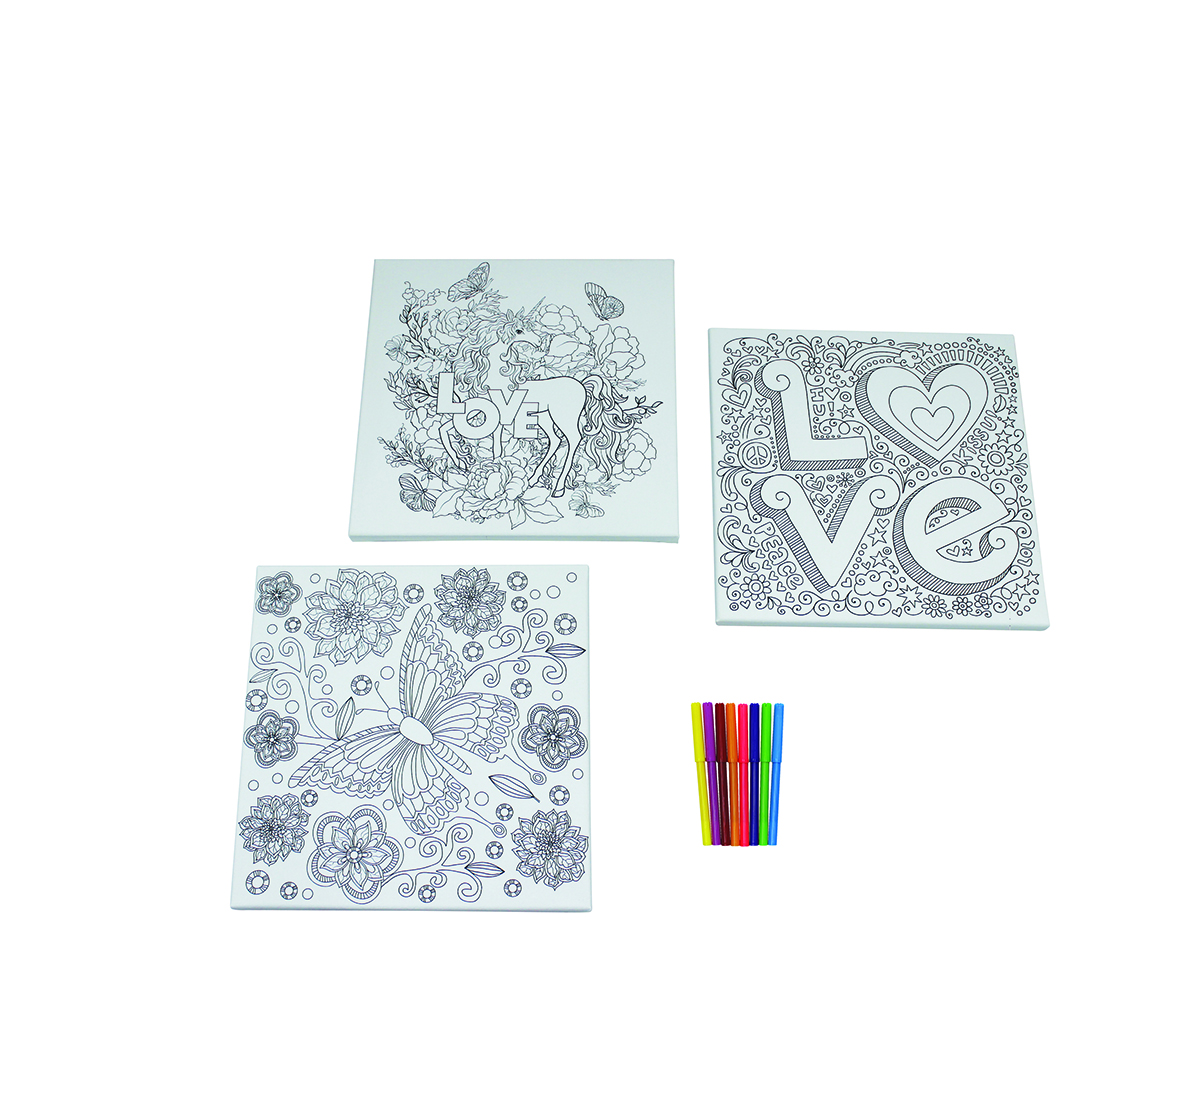 Youreka | Youreka Cool Canvas Art DIY Art & Craft Kits for Kids age 3Y+